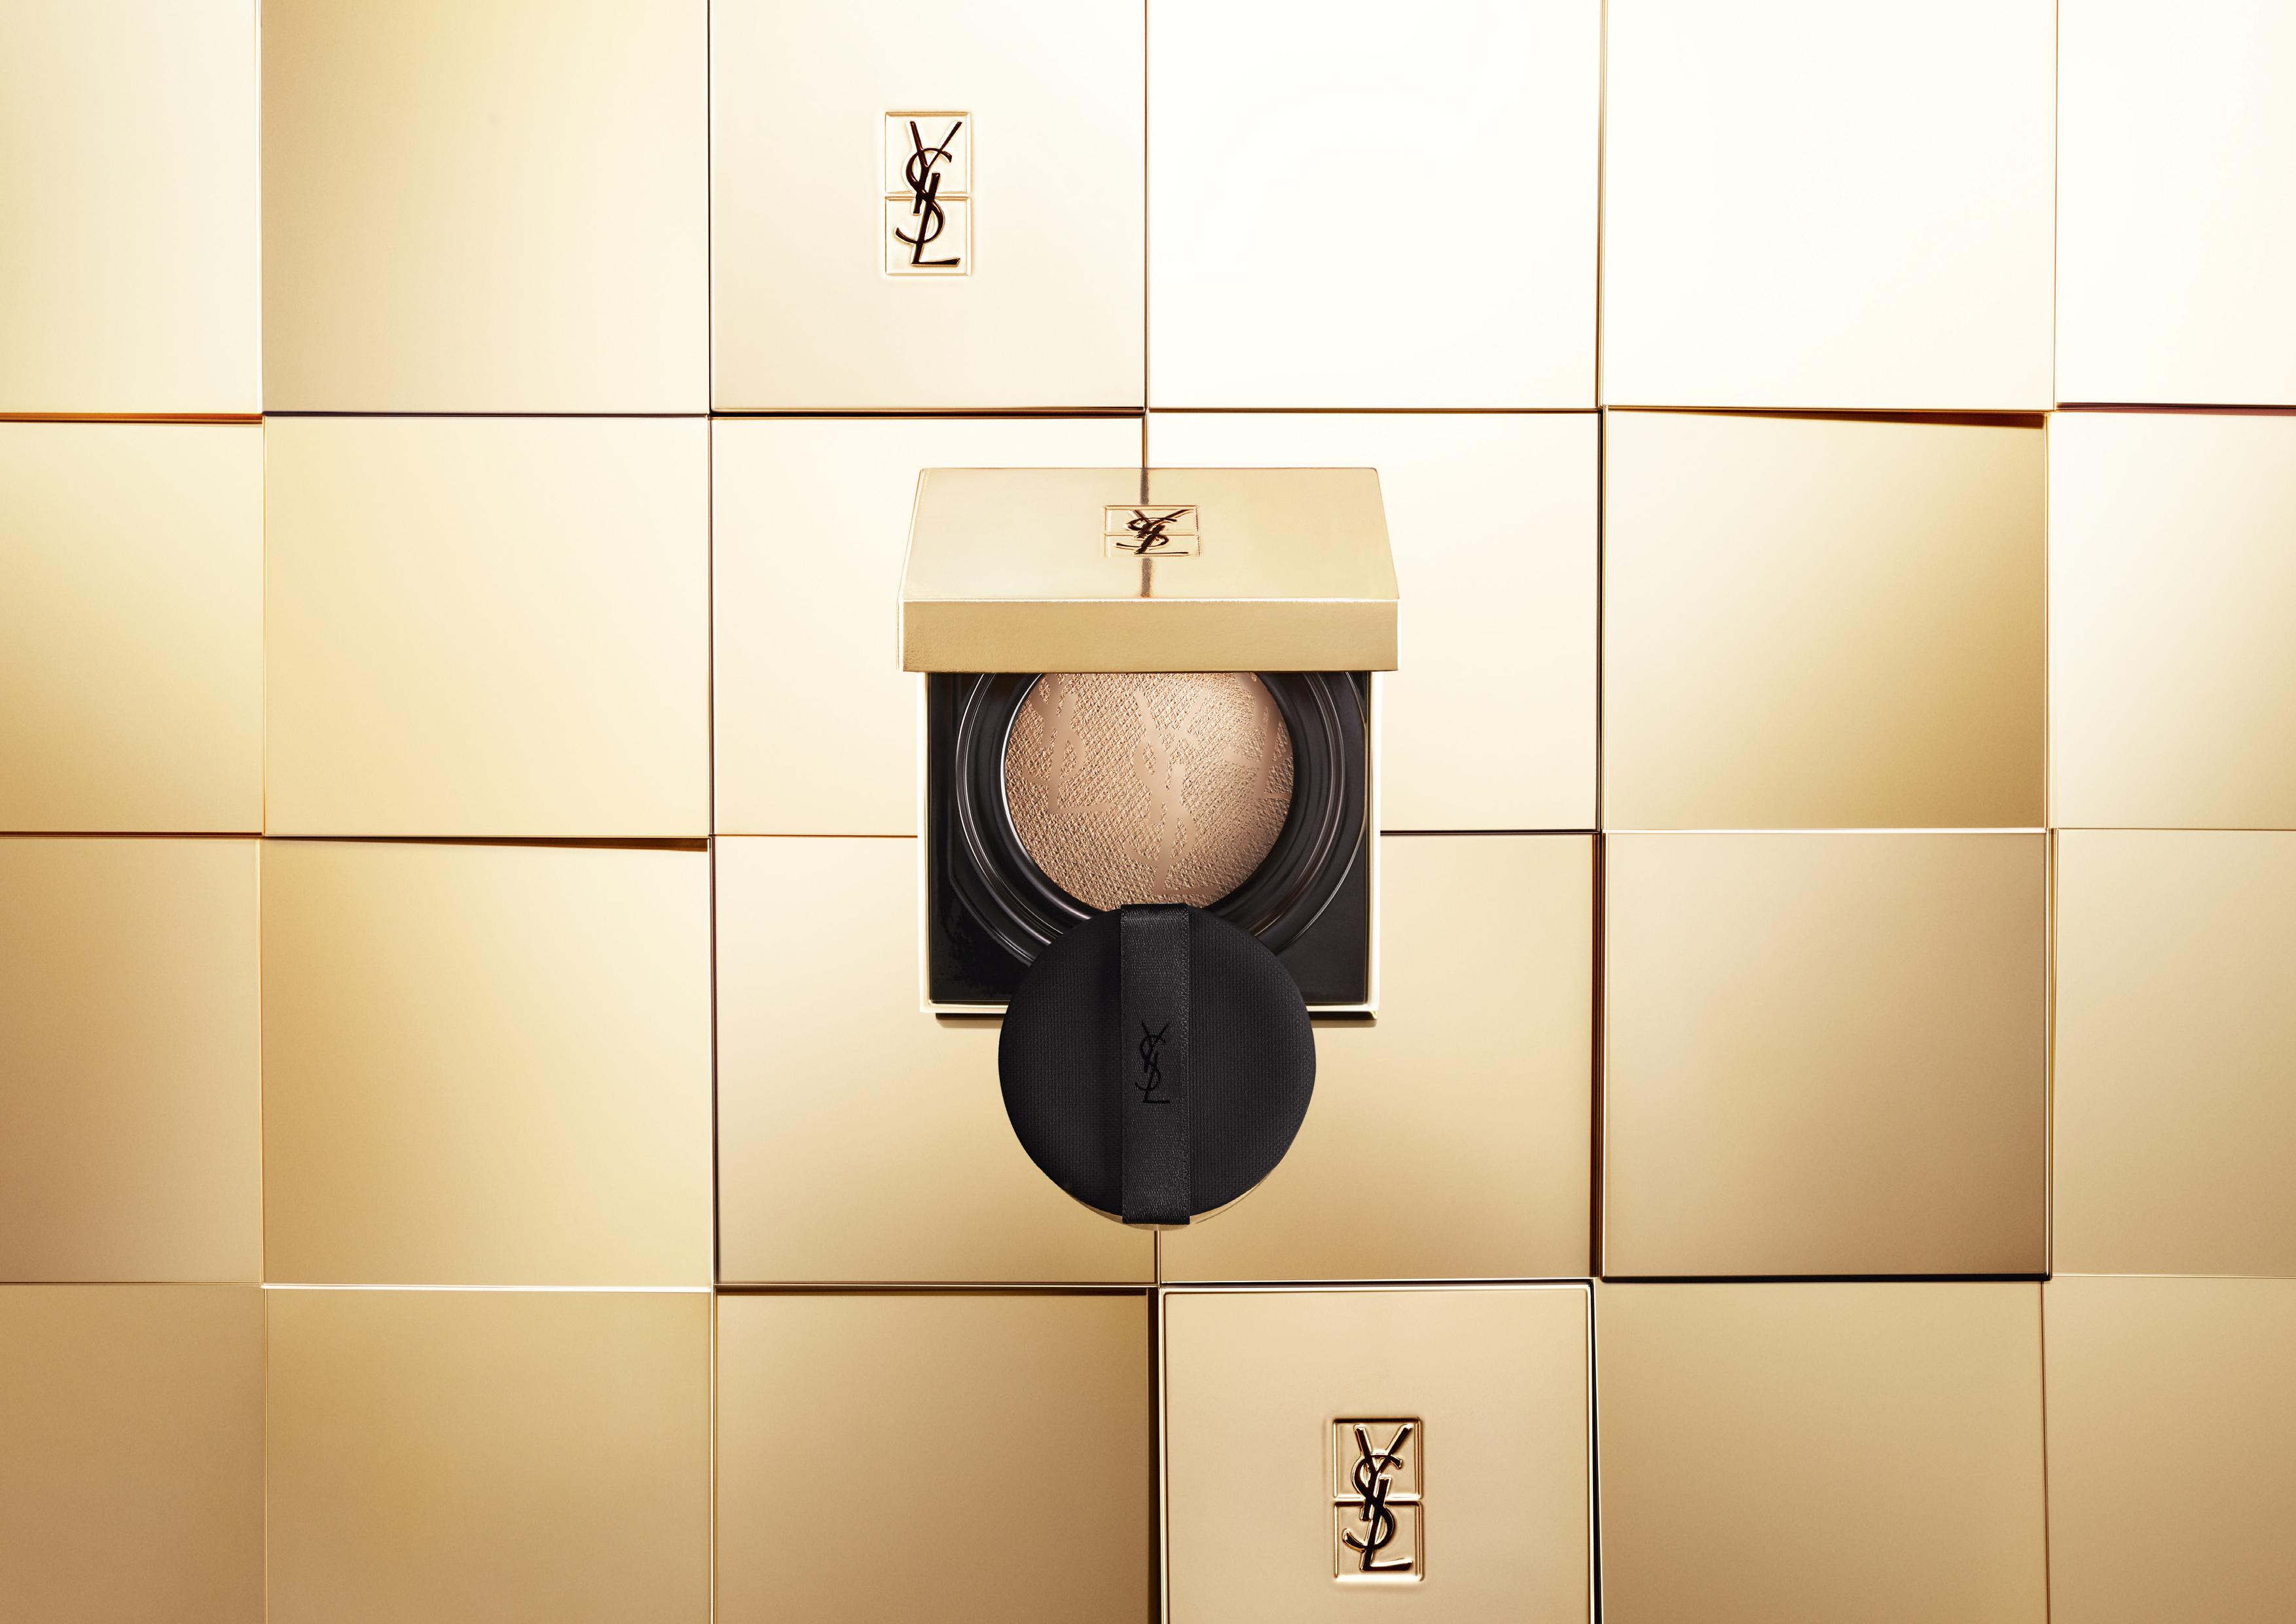 Yves Saint Laurent Beauté,イヴ・サンローラン・ボーテ,ファンデーション